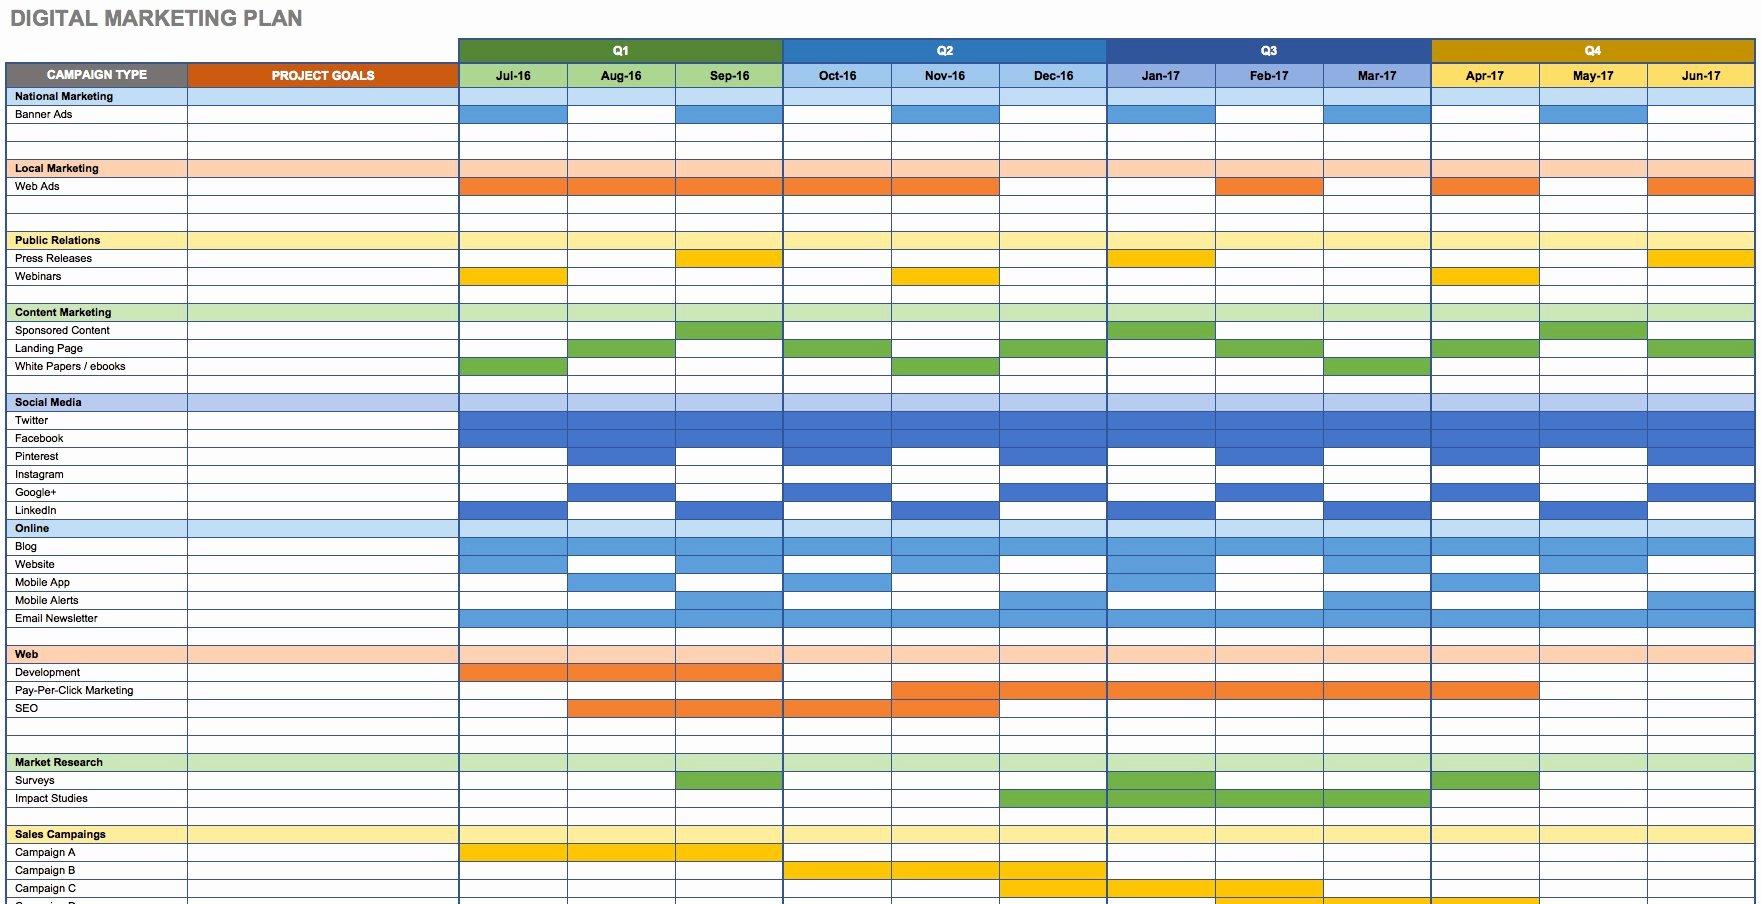 Digital Marketing Budget Template Luxury Free Marketing Plan Templates for Excel Smartsheet